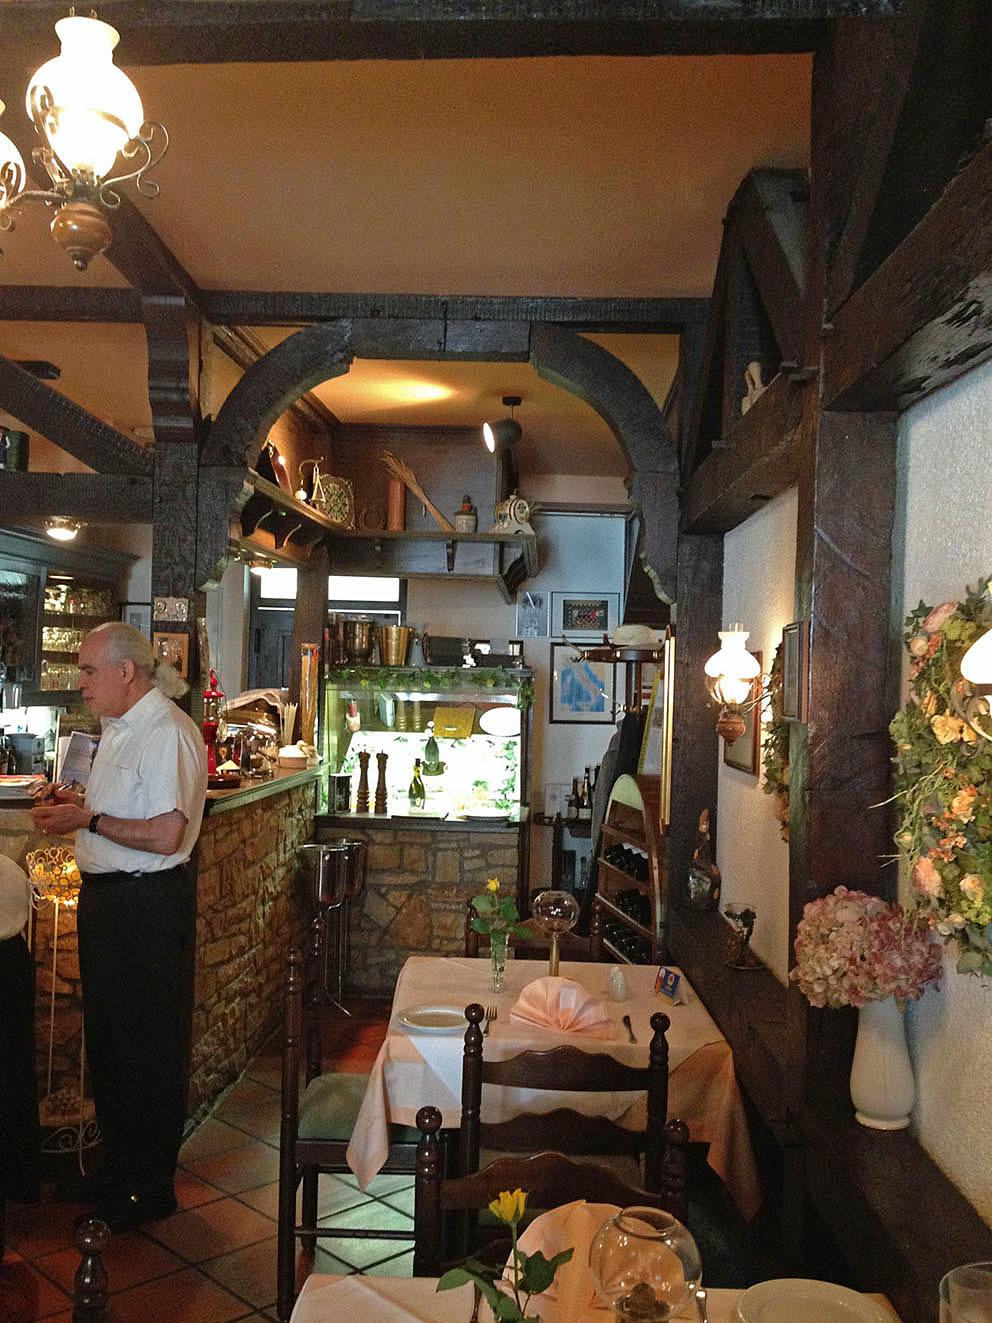 La Fontana das italienische Restaurant in Hameln